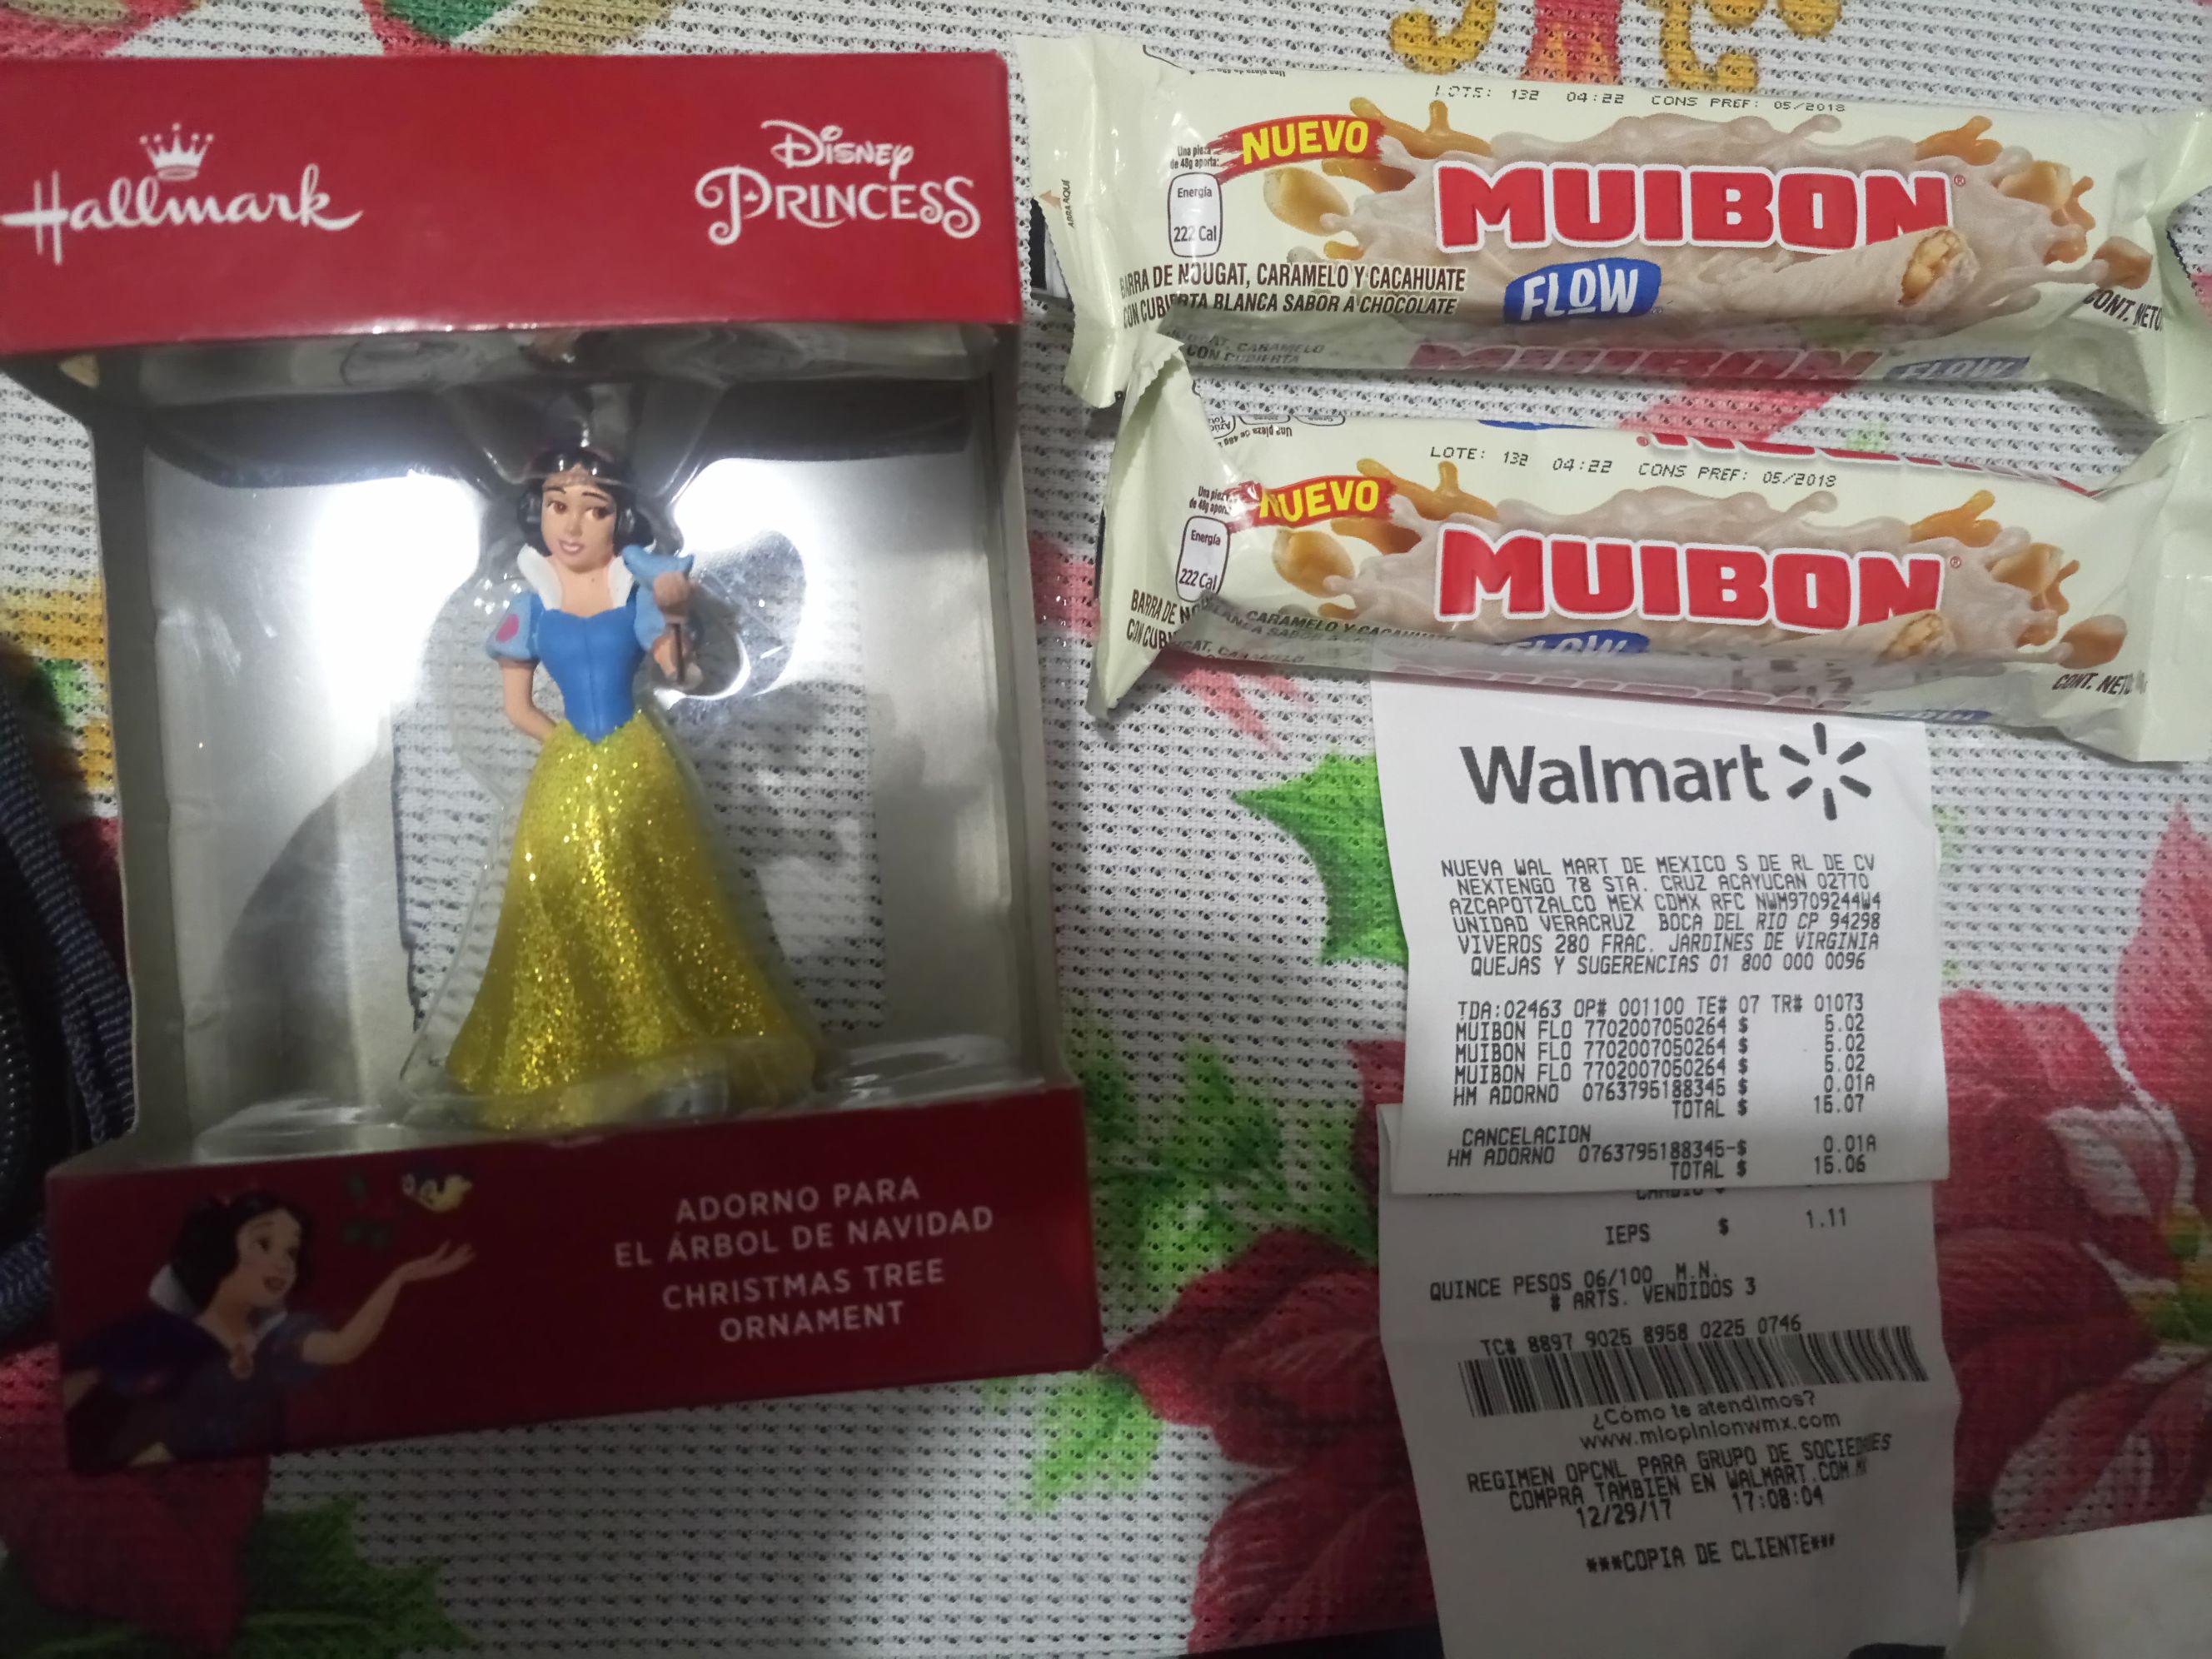 Walmart: Chocolate Muibon a $5.02